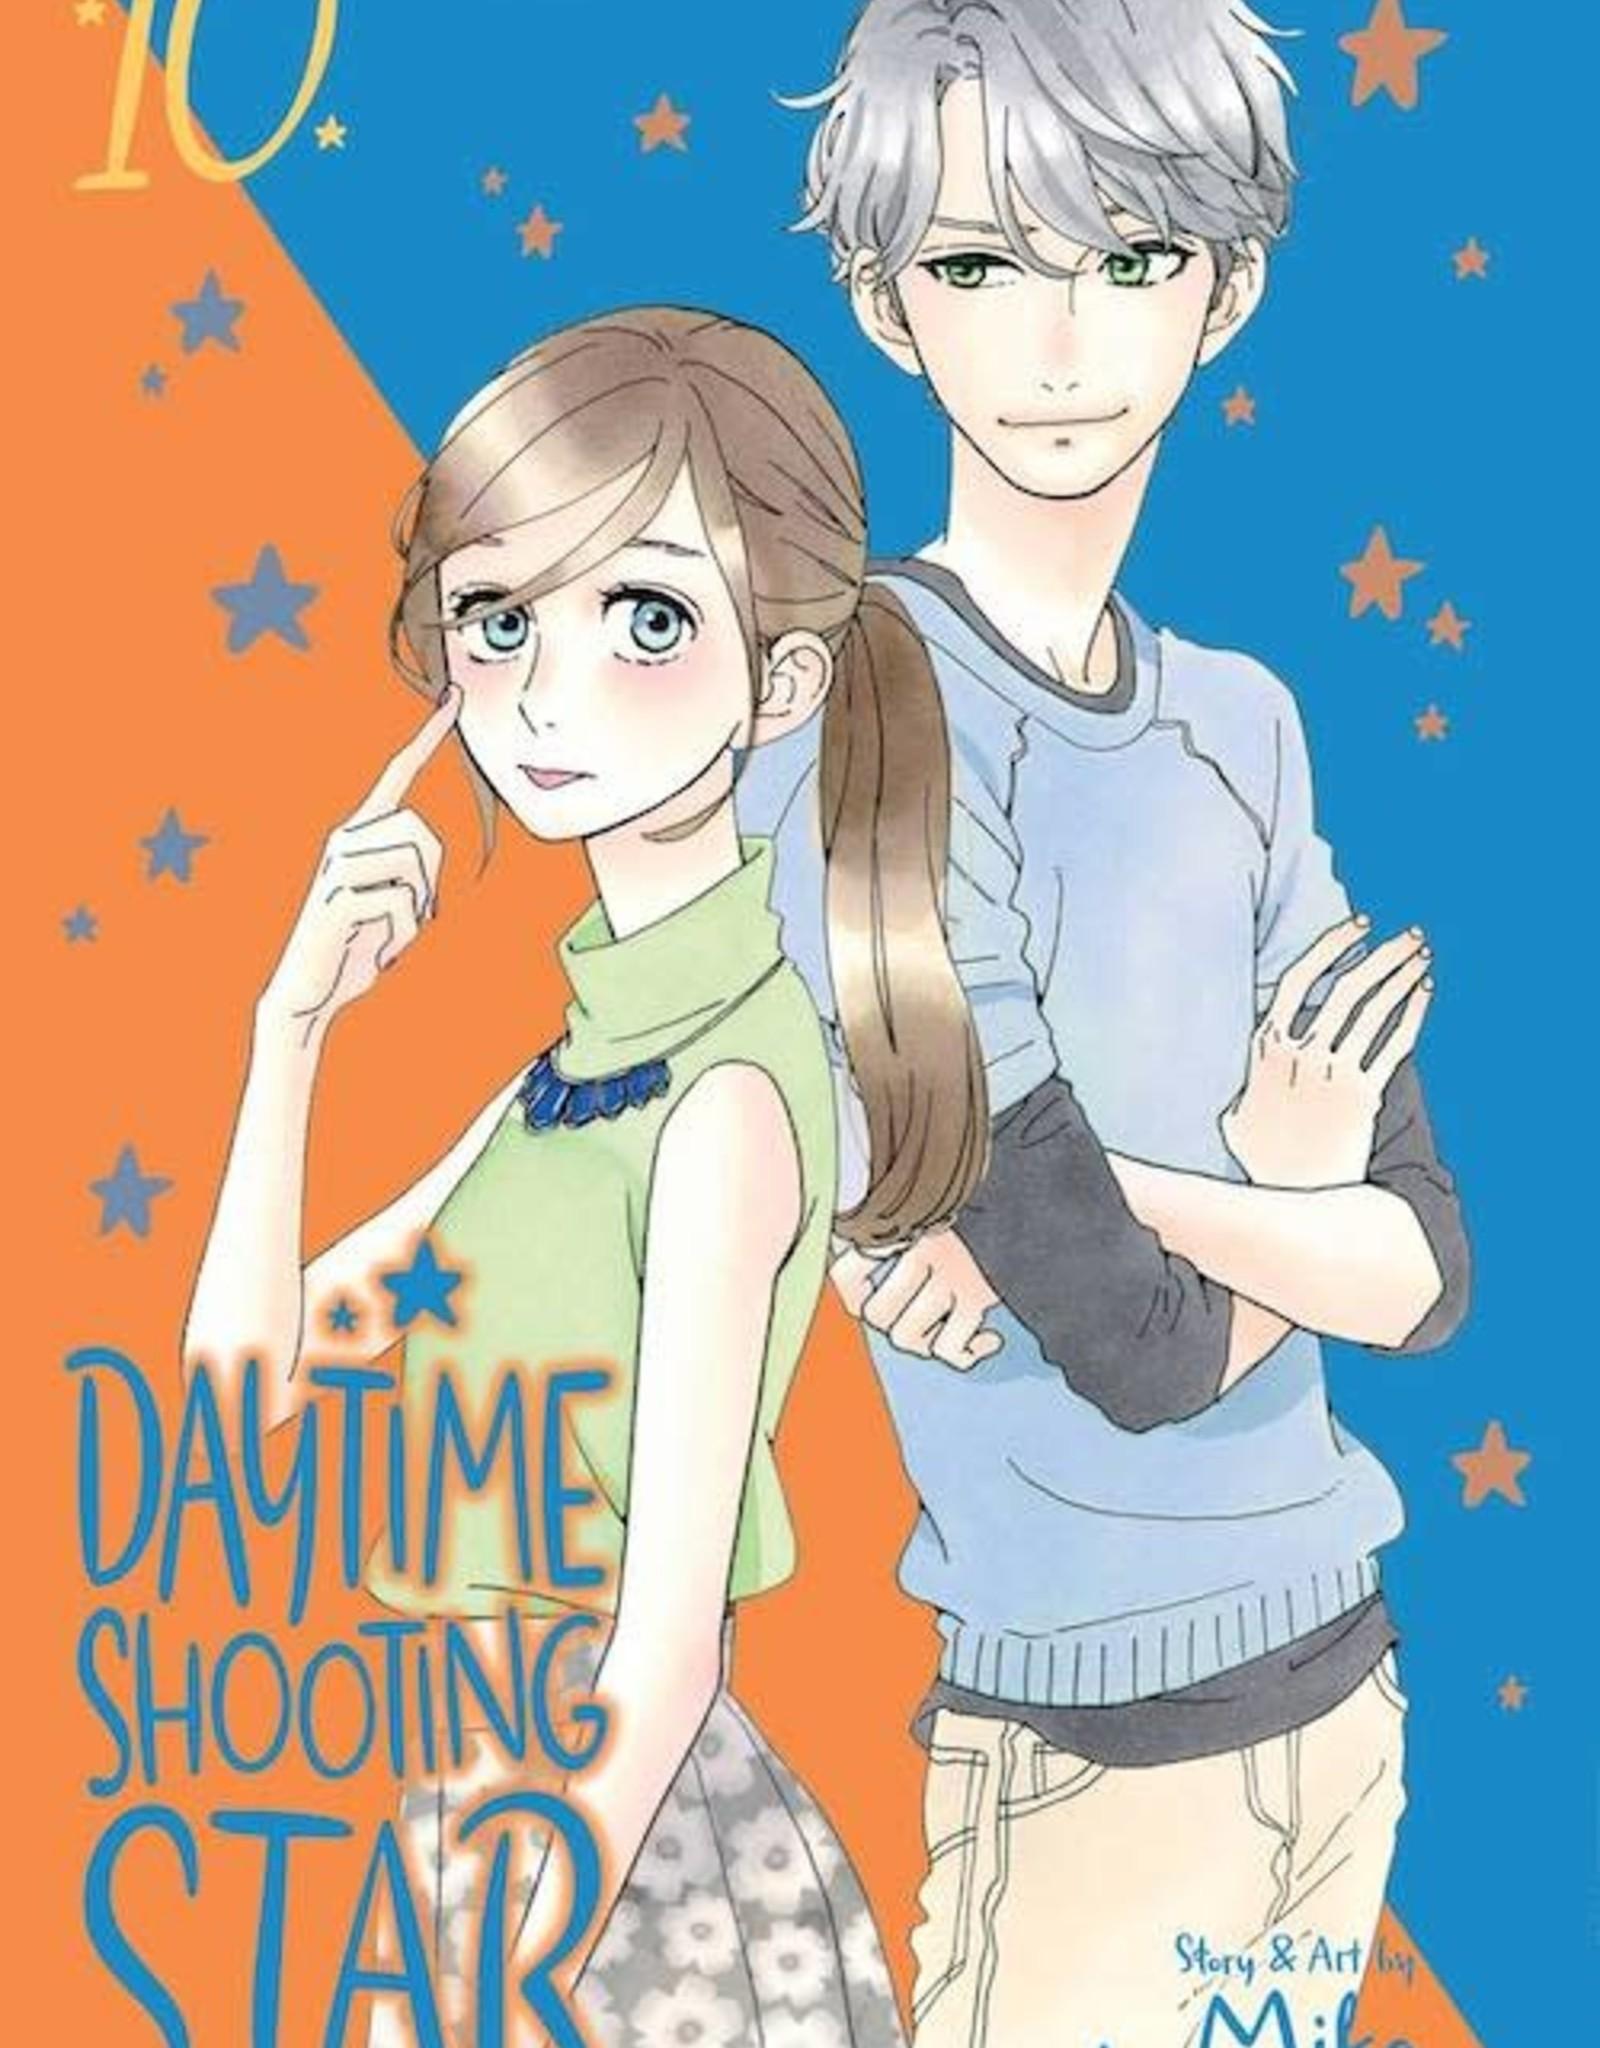 Viz Media Daytime Shooting Star GN Vol 10